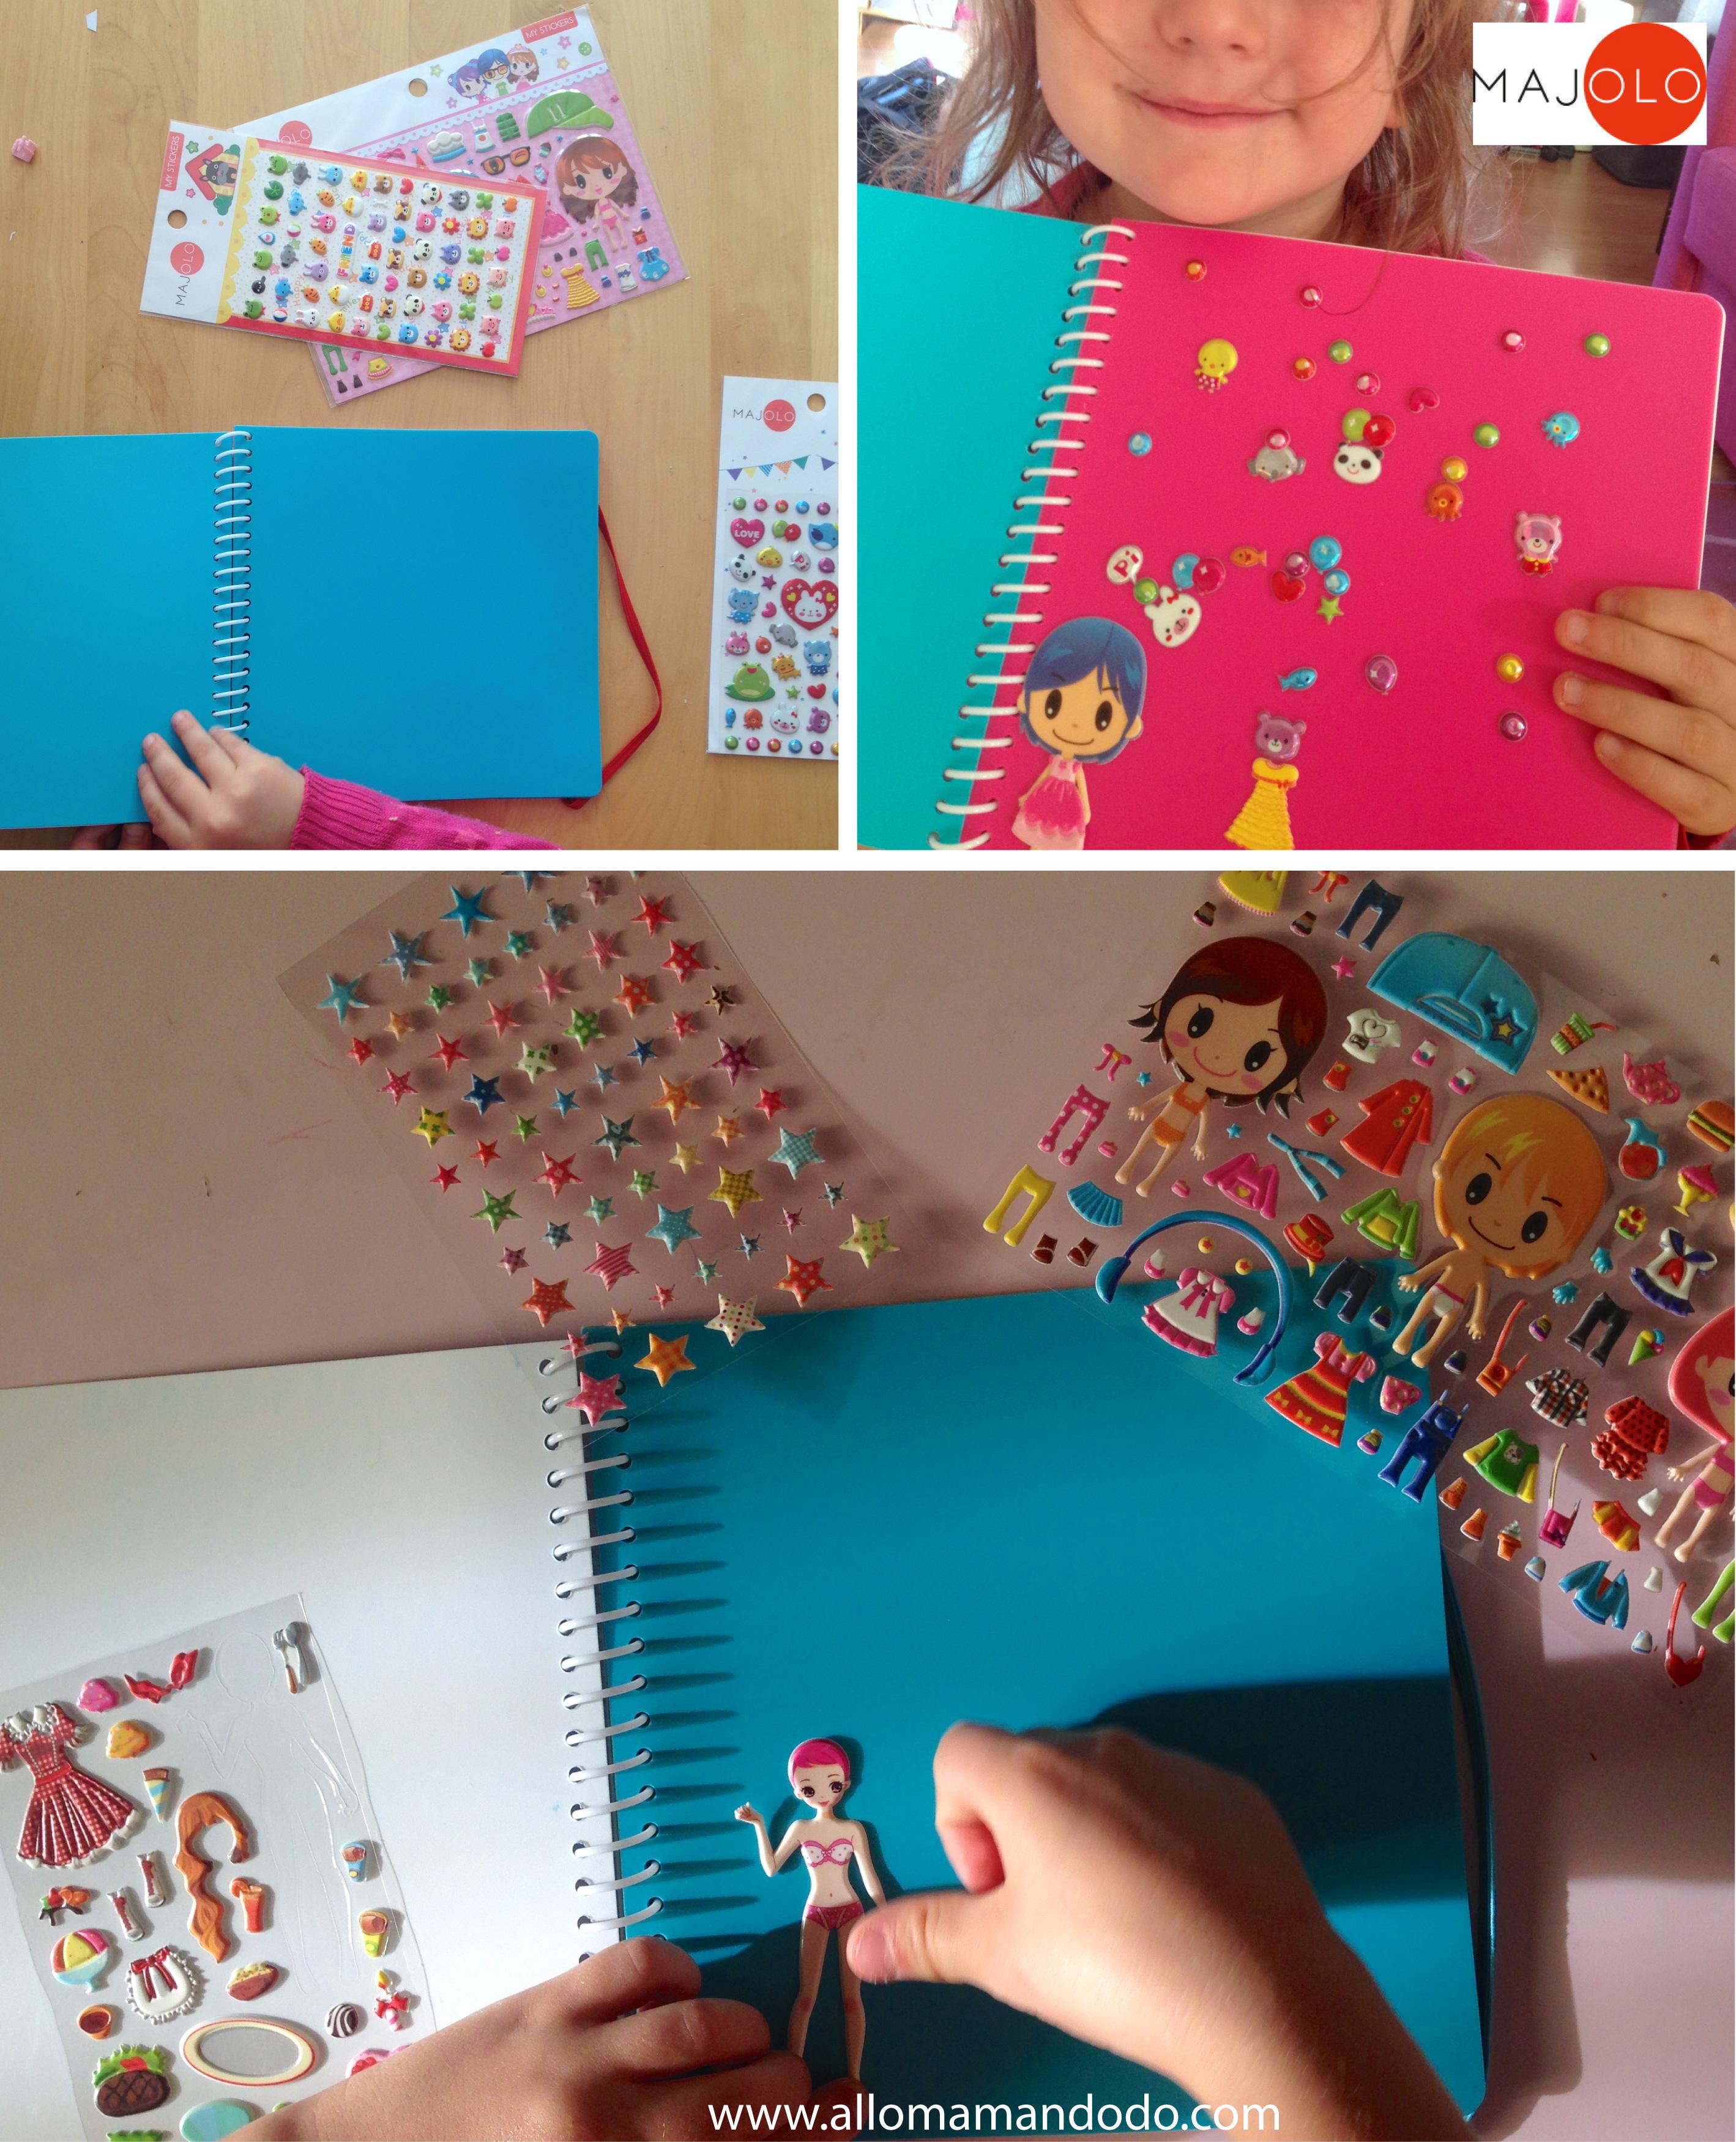 majolo-2-cadeau-enfant-stickers